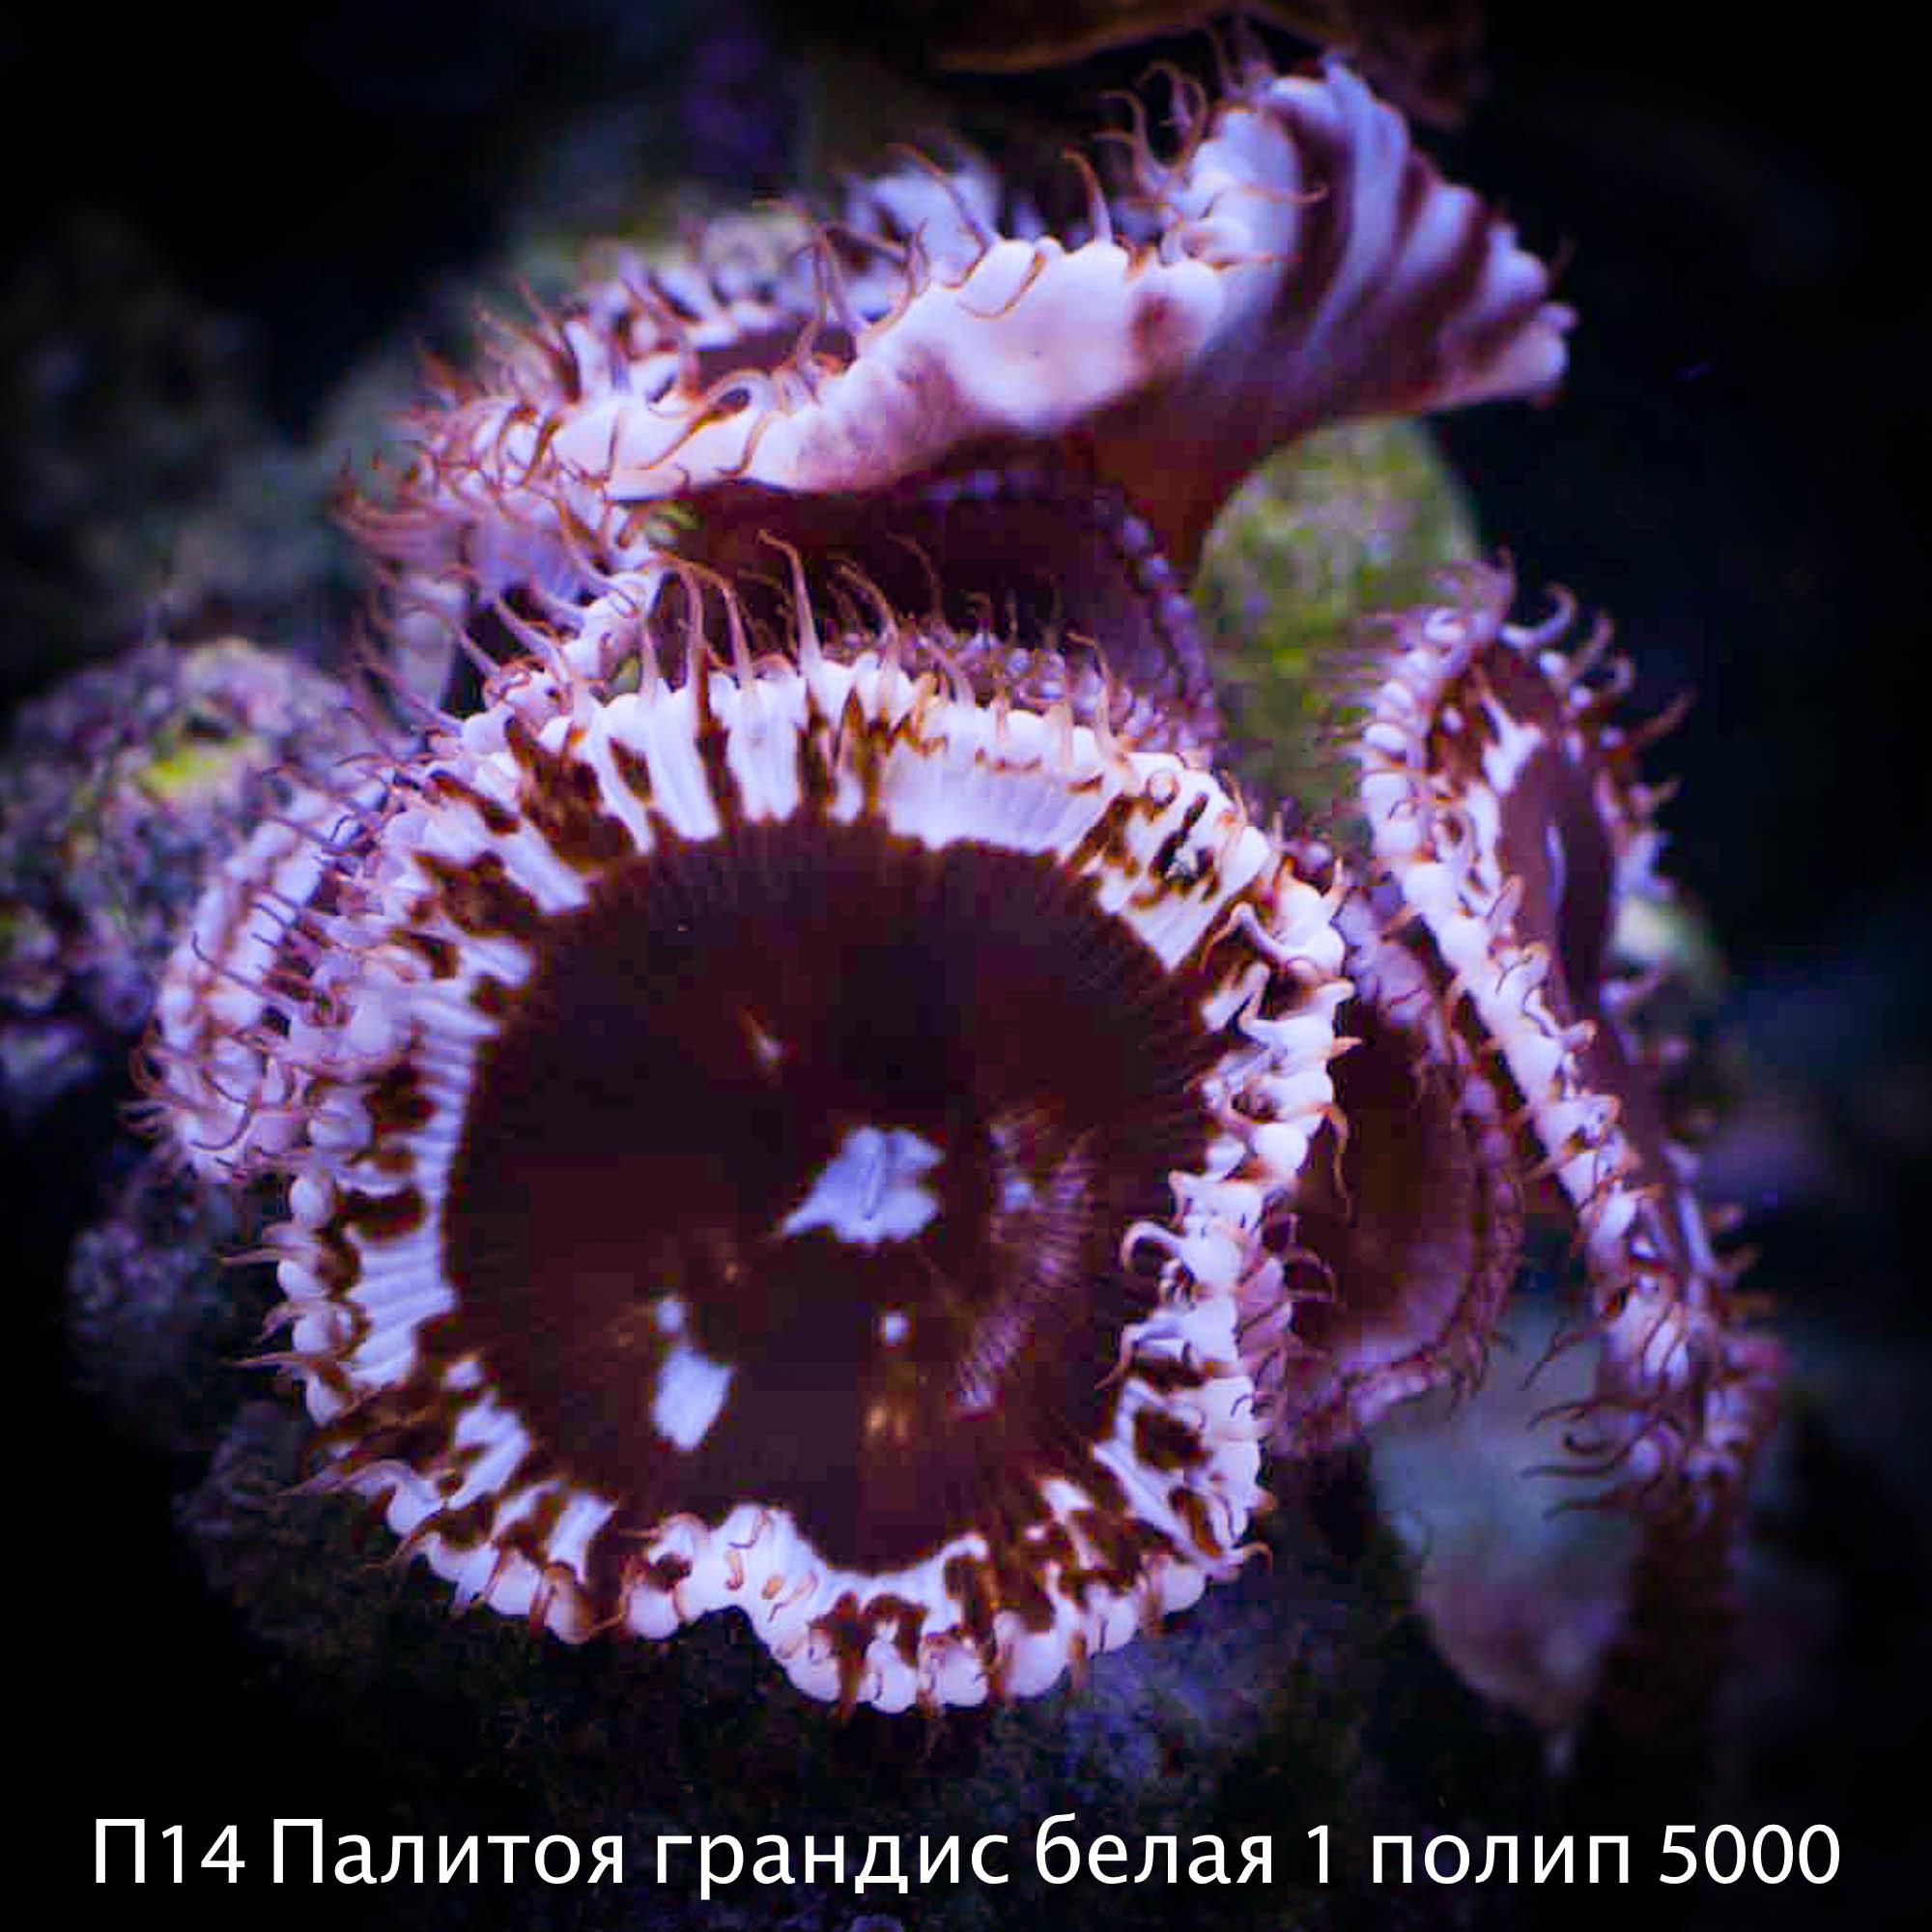 П14 Палитоя грандис белая 1 полип 5000